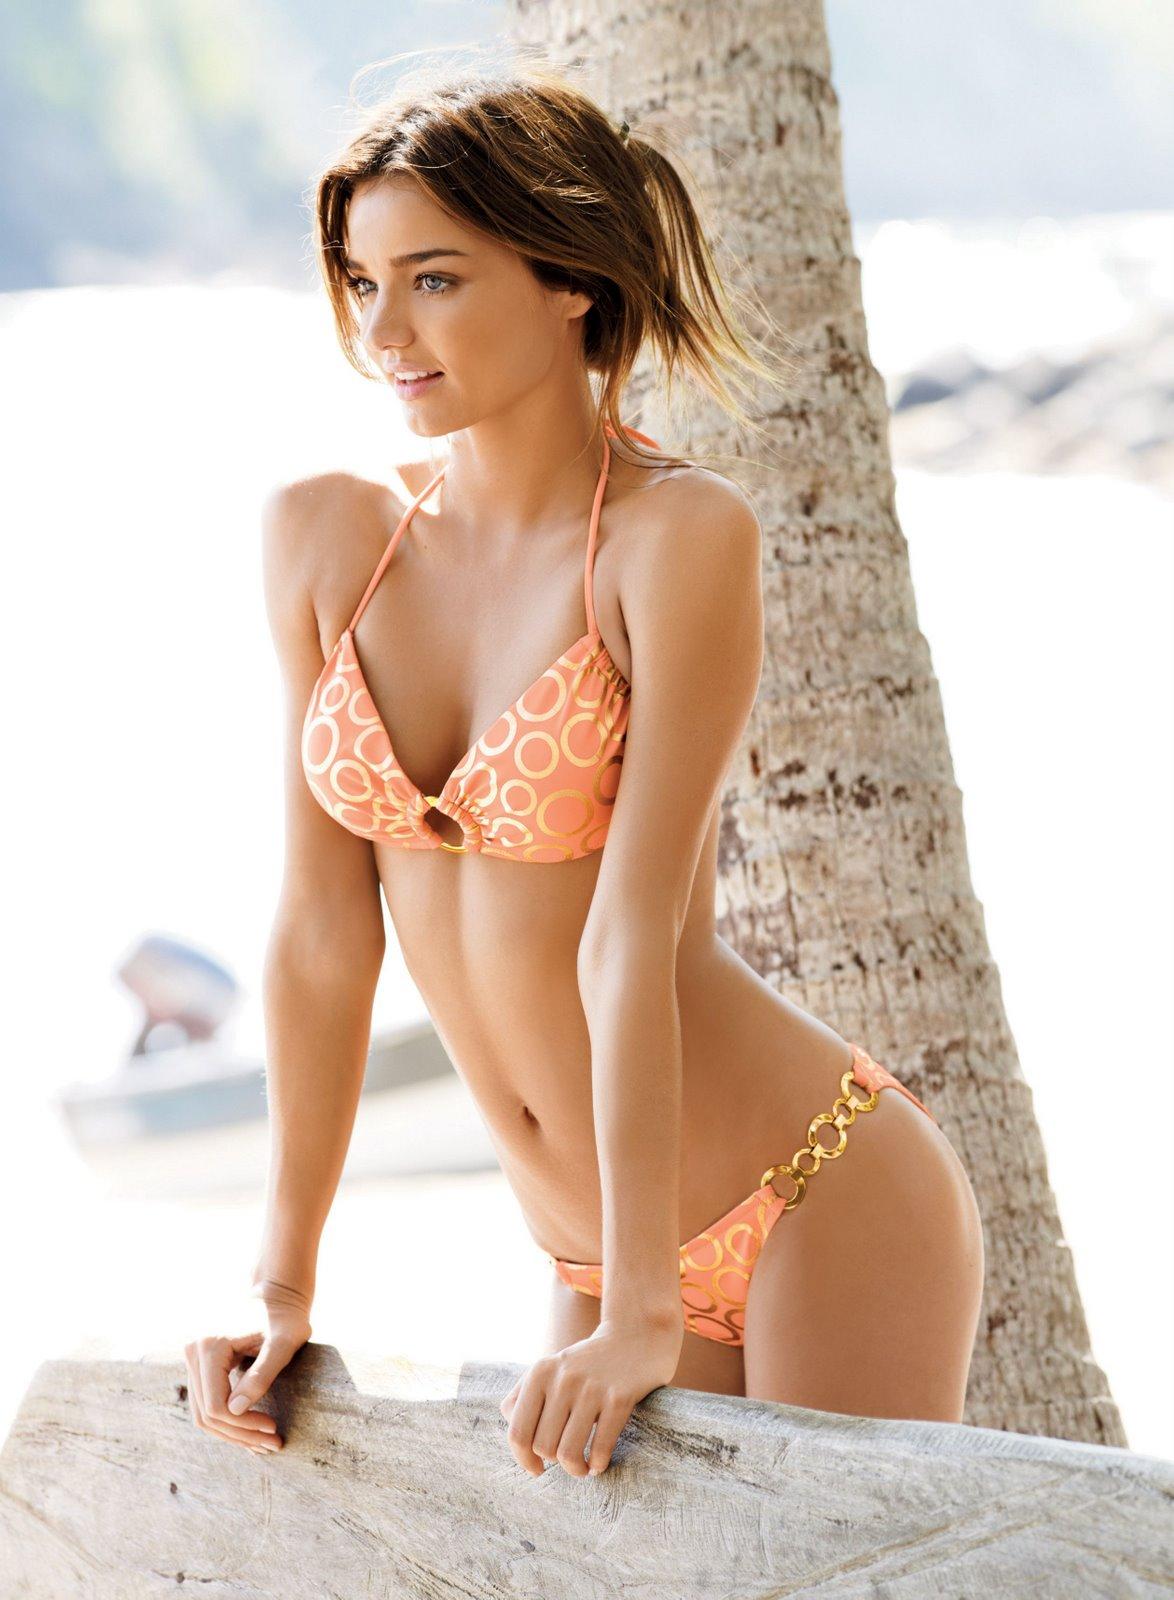 BModels: Miranda Kerr - Victoria's Secret Swimsuit 2009